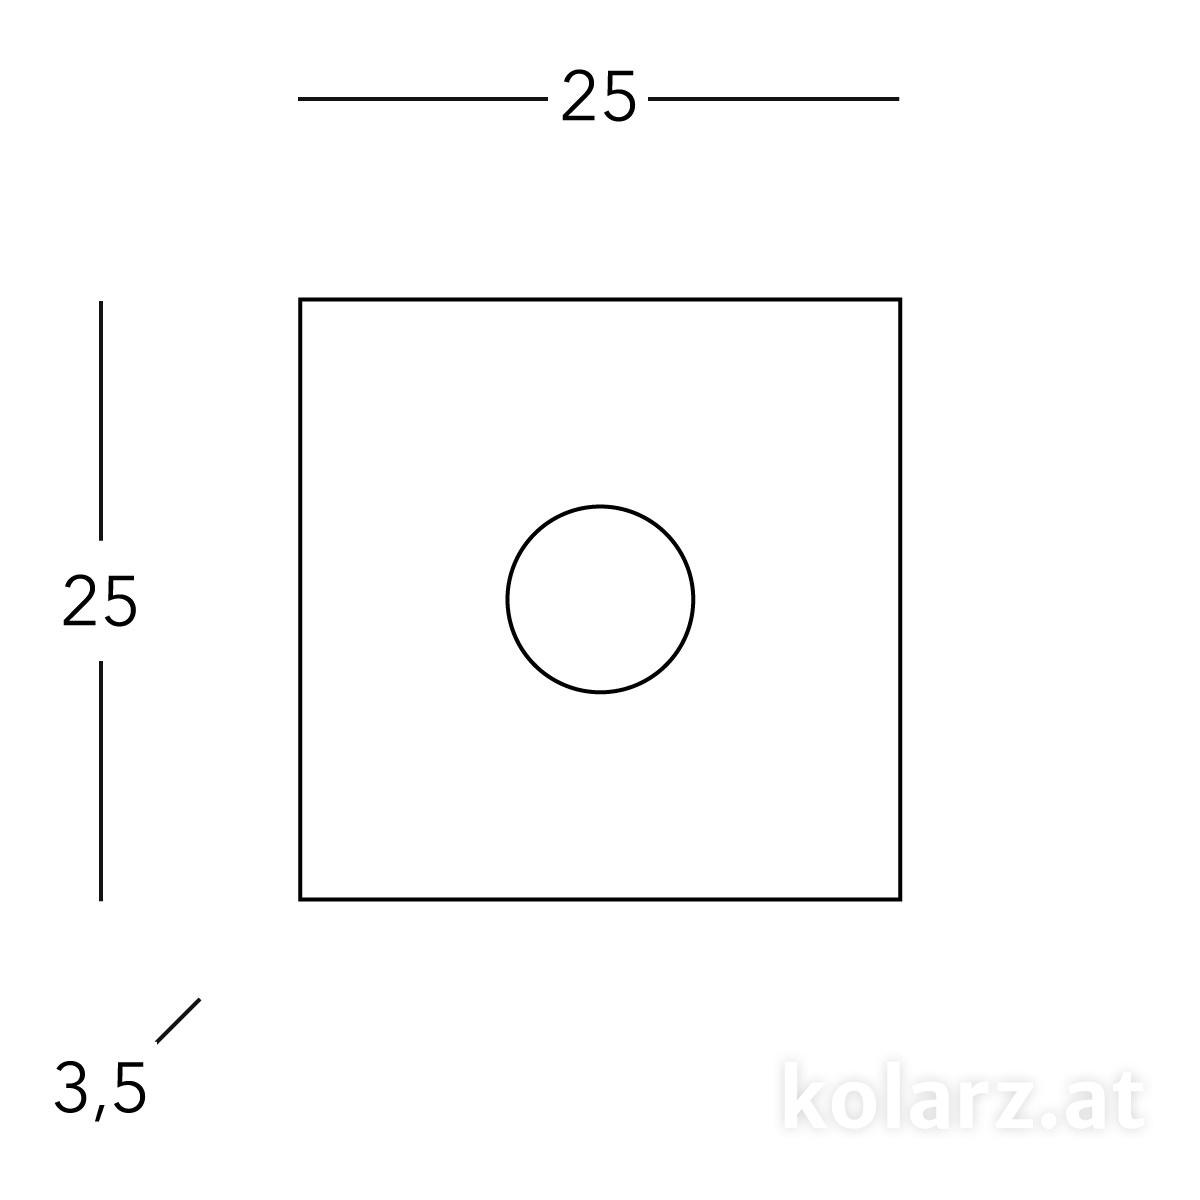 A1337-11-1-Cu-s1.jpg